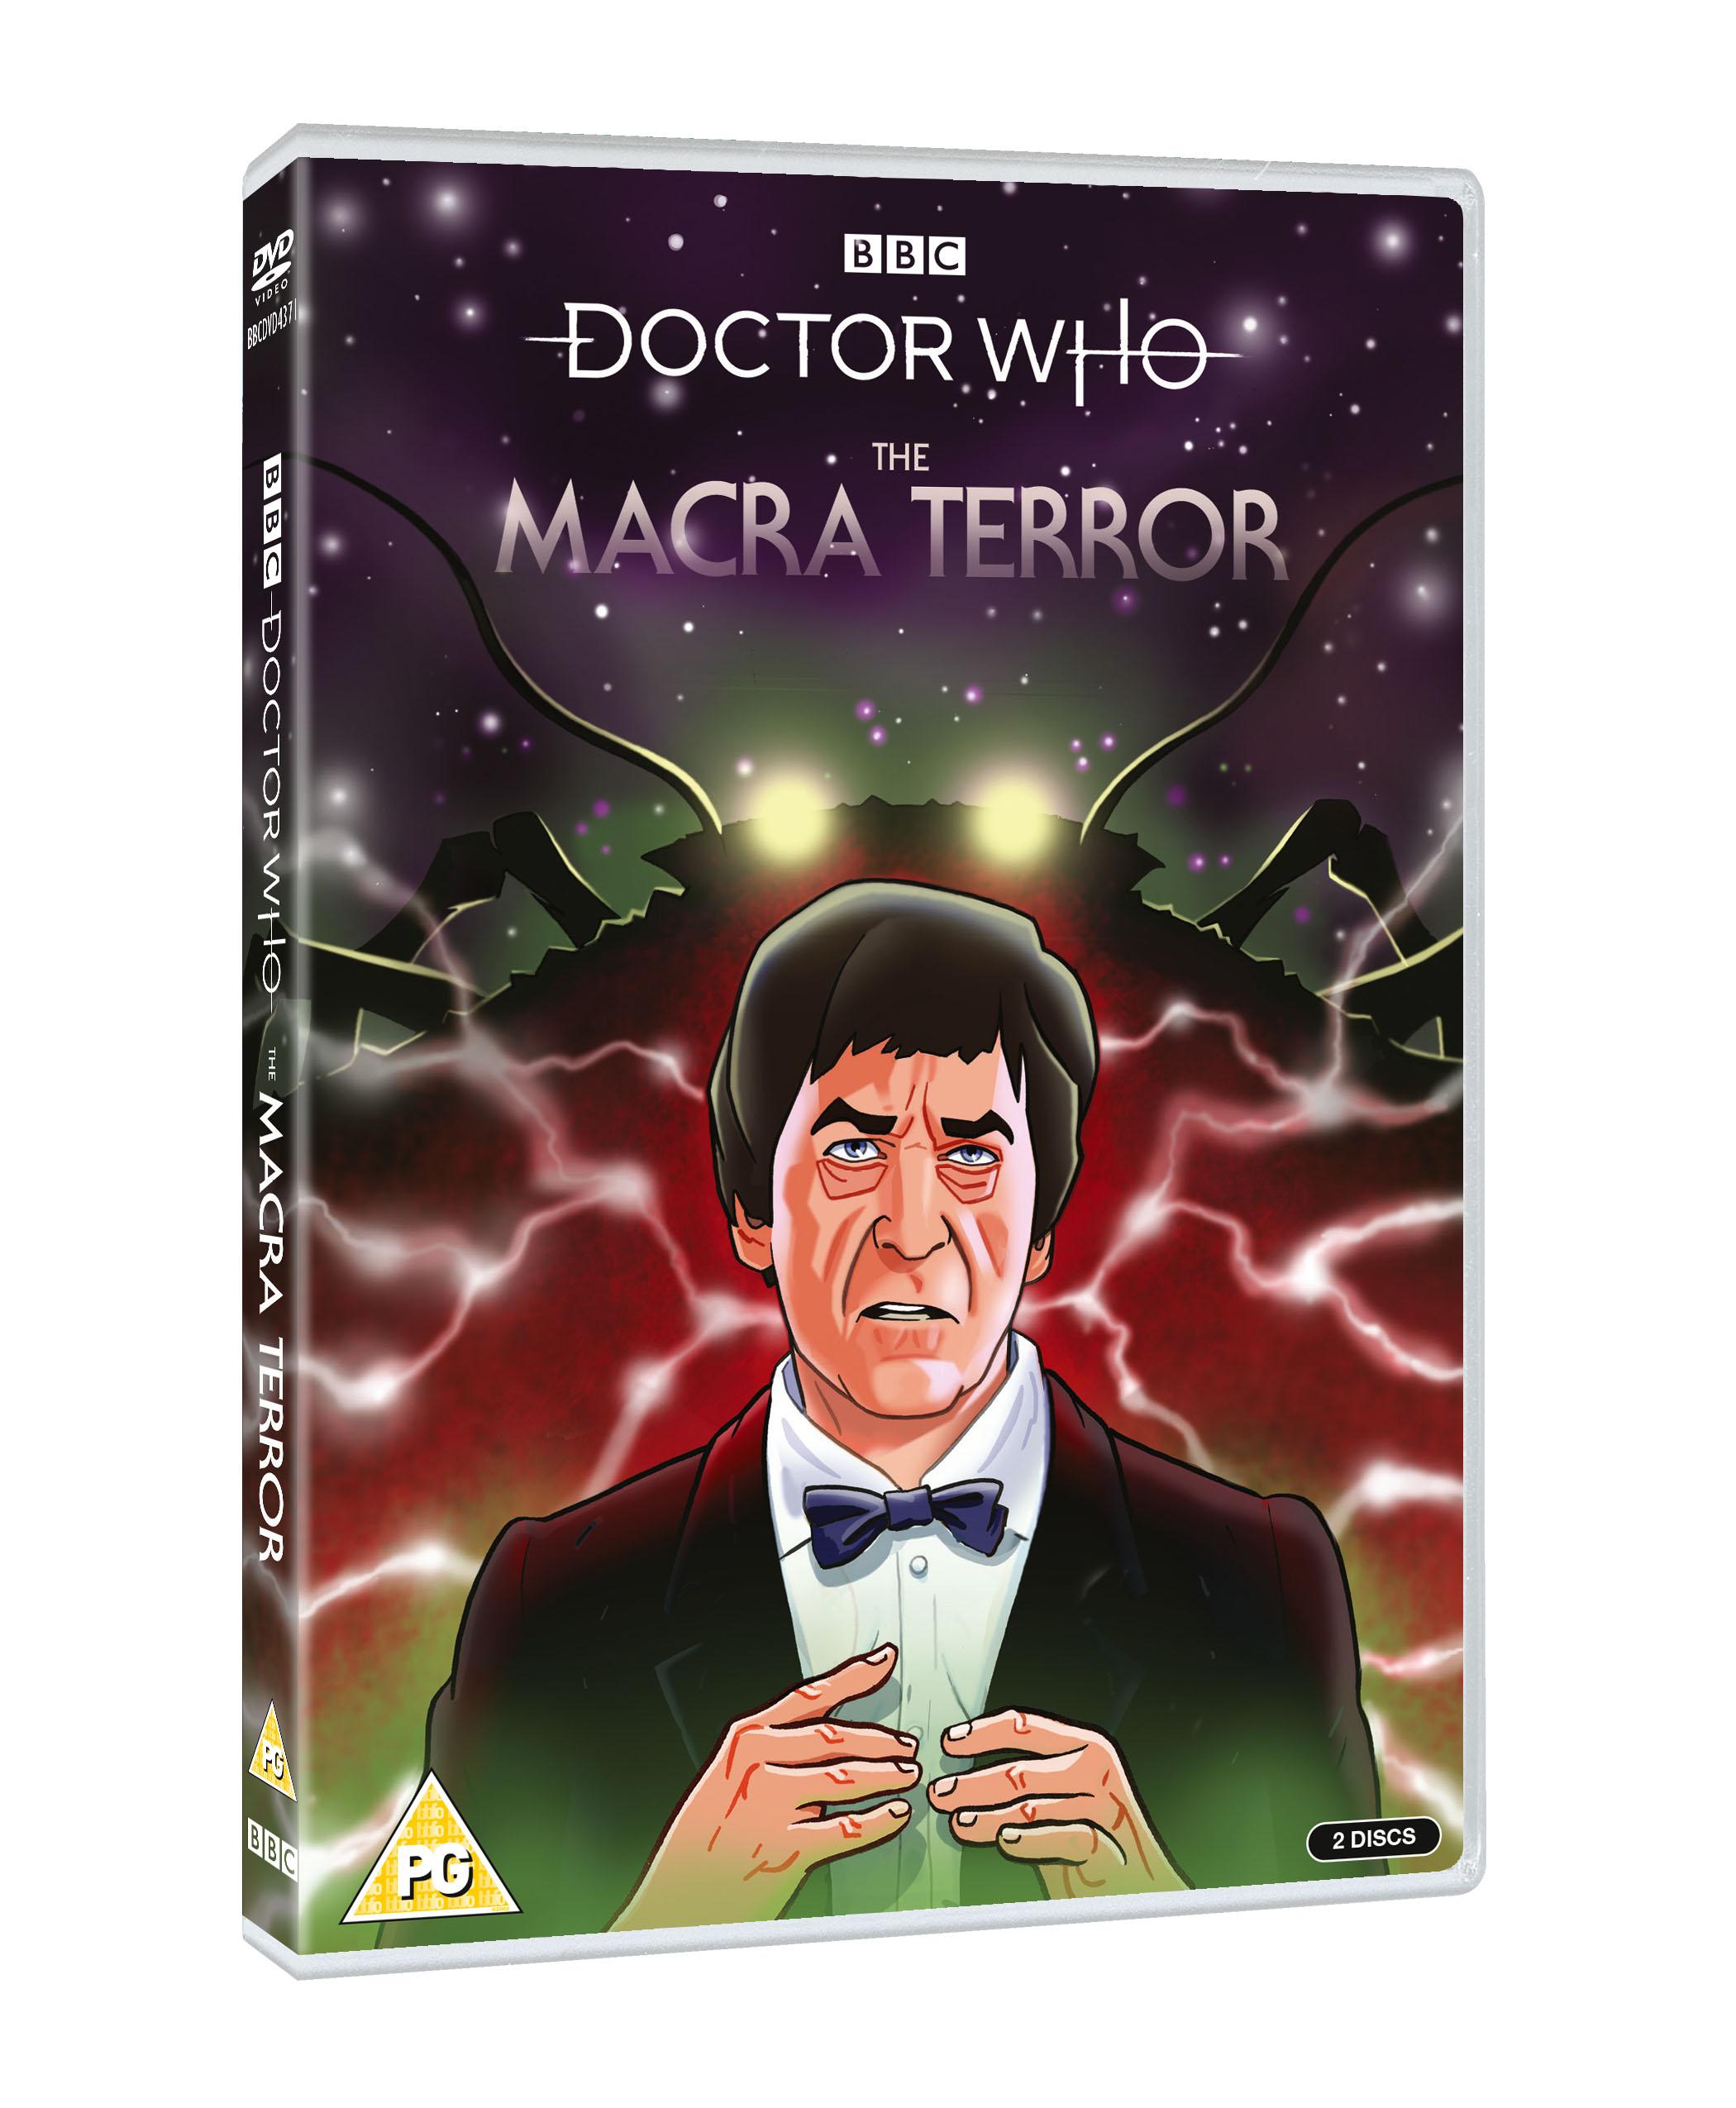 The Macra Terror (Credit: BBC Studios)